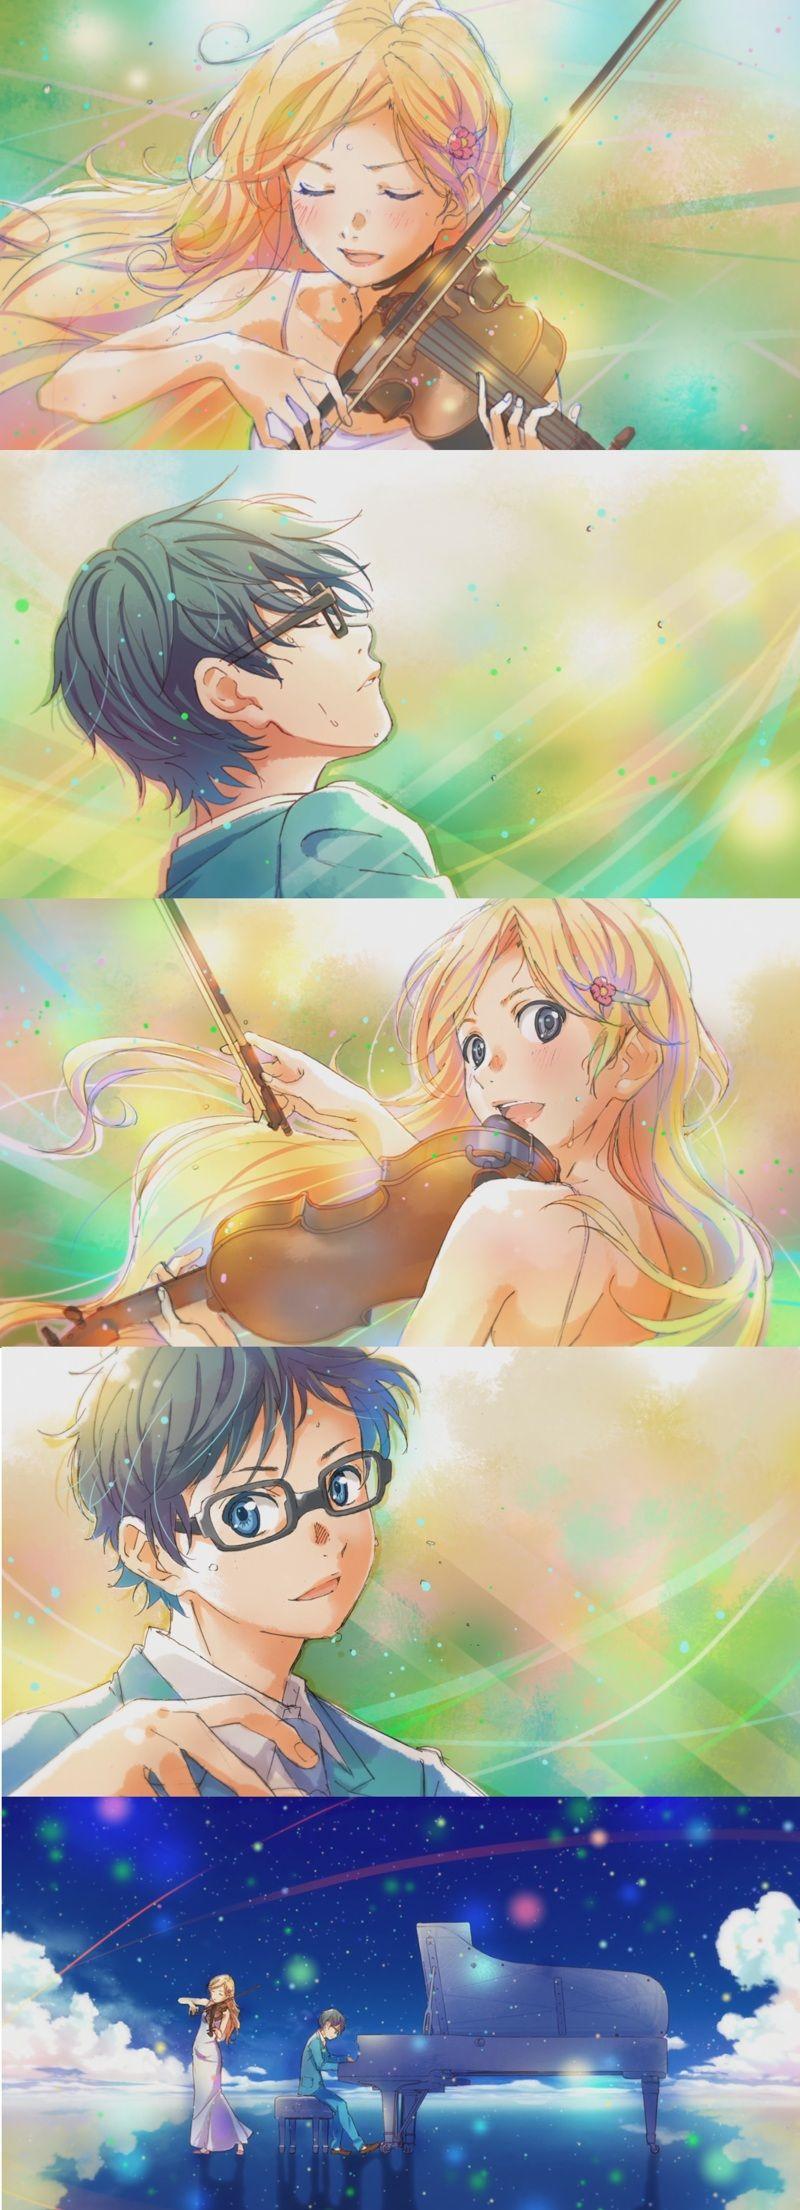 So Beautiful Shigatsu Wa Kimi Fondo De Pantalla De Anime Fondo De Anime Awesome phone your lie in april anime